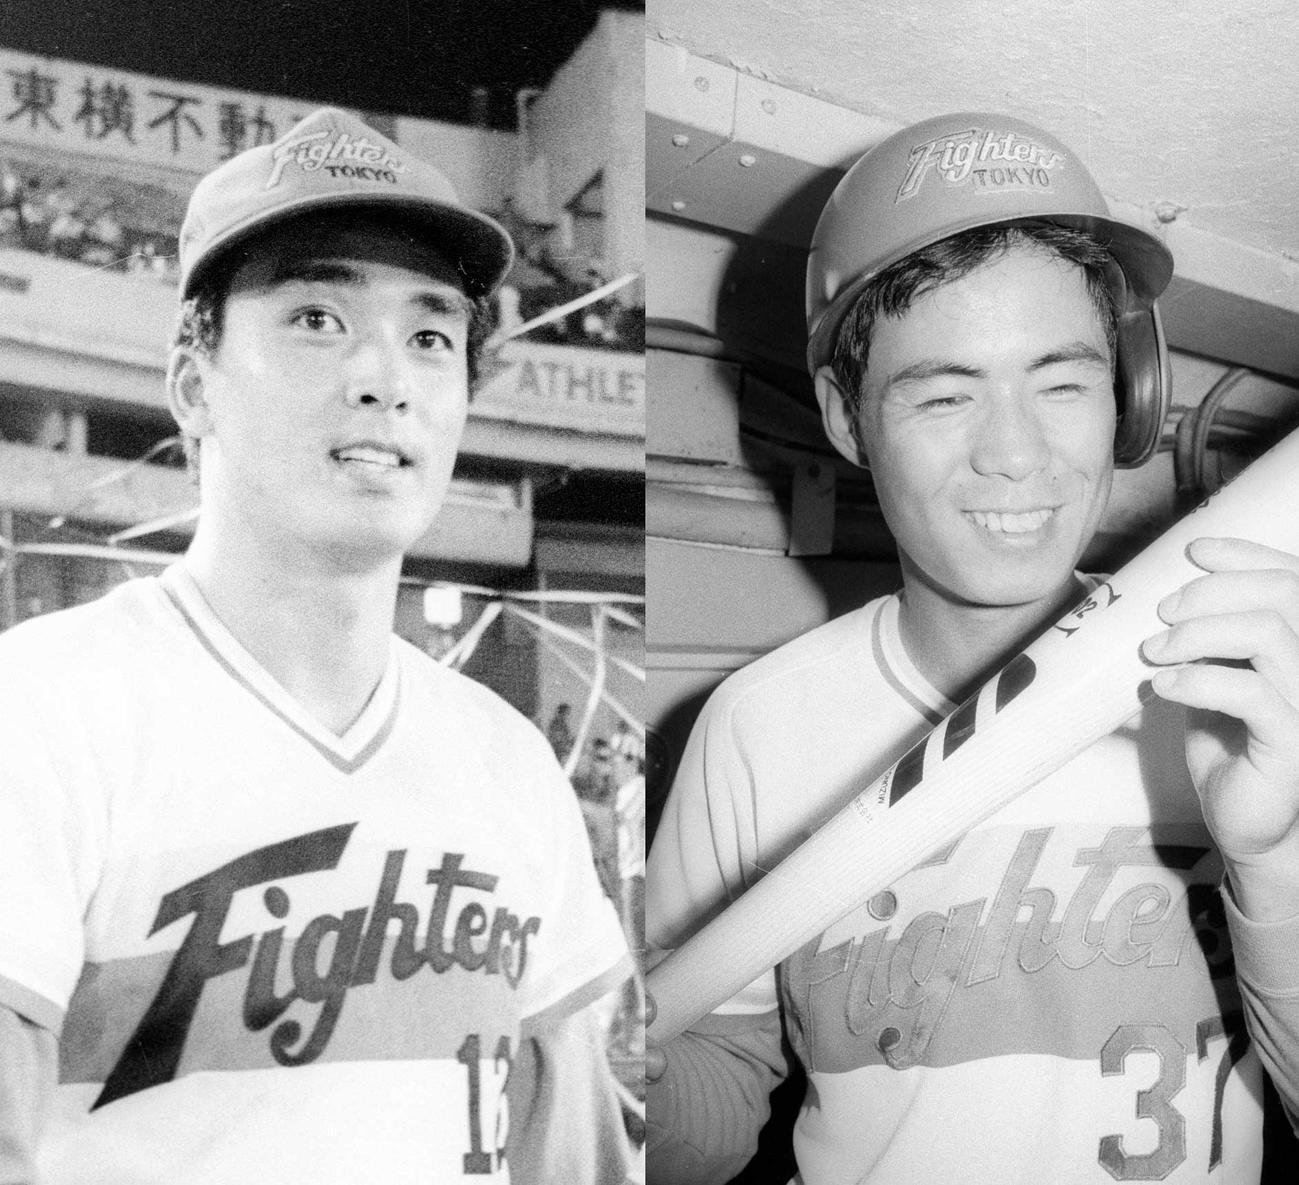 日本ハム田中幸雄投手(左、83年8月25日撮影)と田中幸雄内野手(86年6月10日撮影)